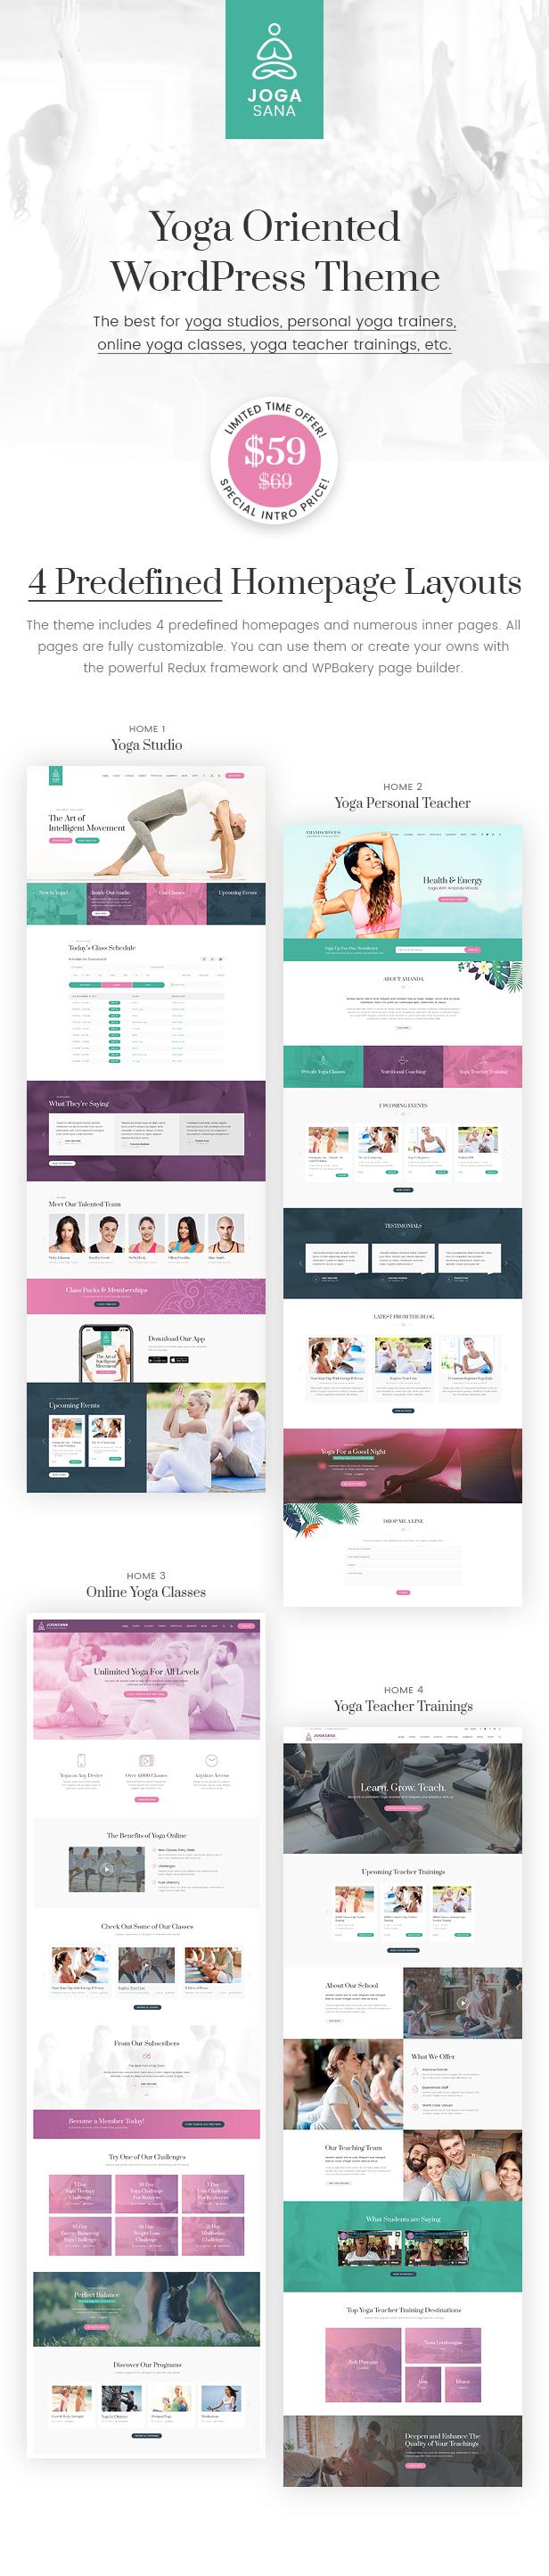 Jogasana - Yoga Oriented WordPress Theme - 1